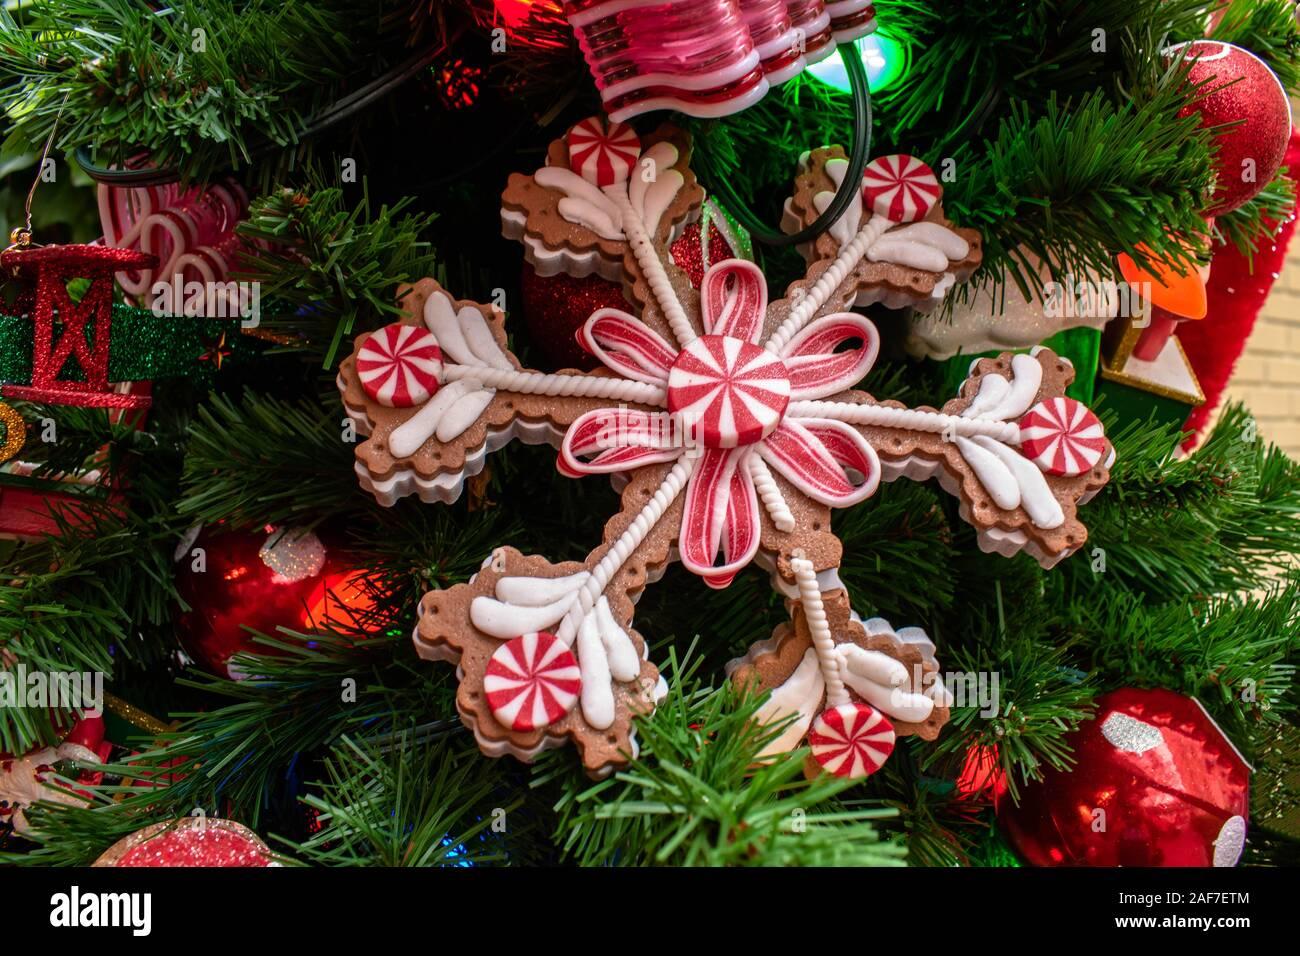 Orlando Florida November 15 2019 Colorful Christmas Ornaments At Magic Kingdom Stock Photo Alamy